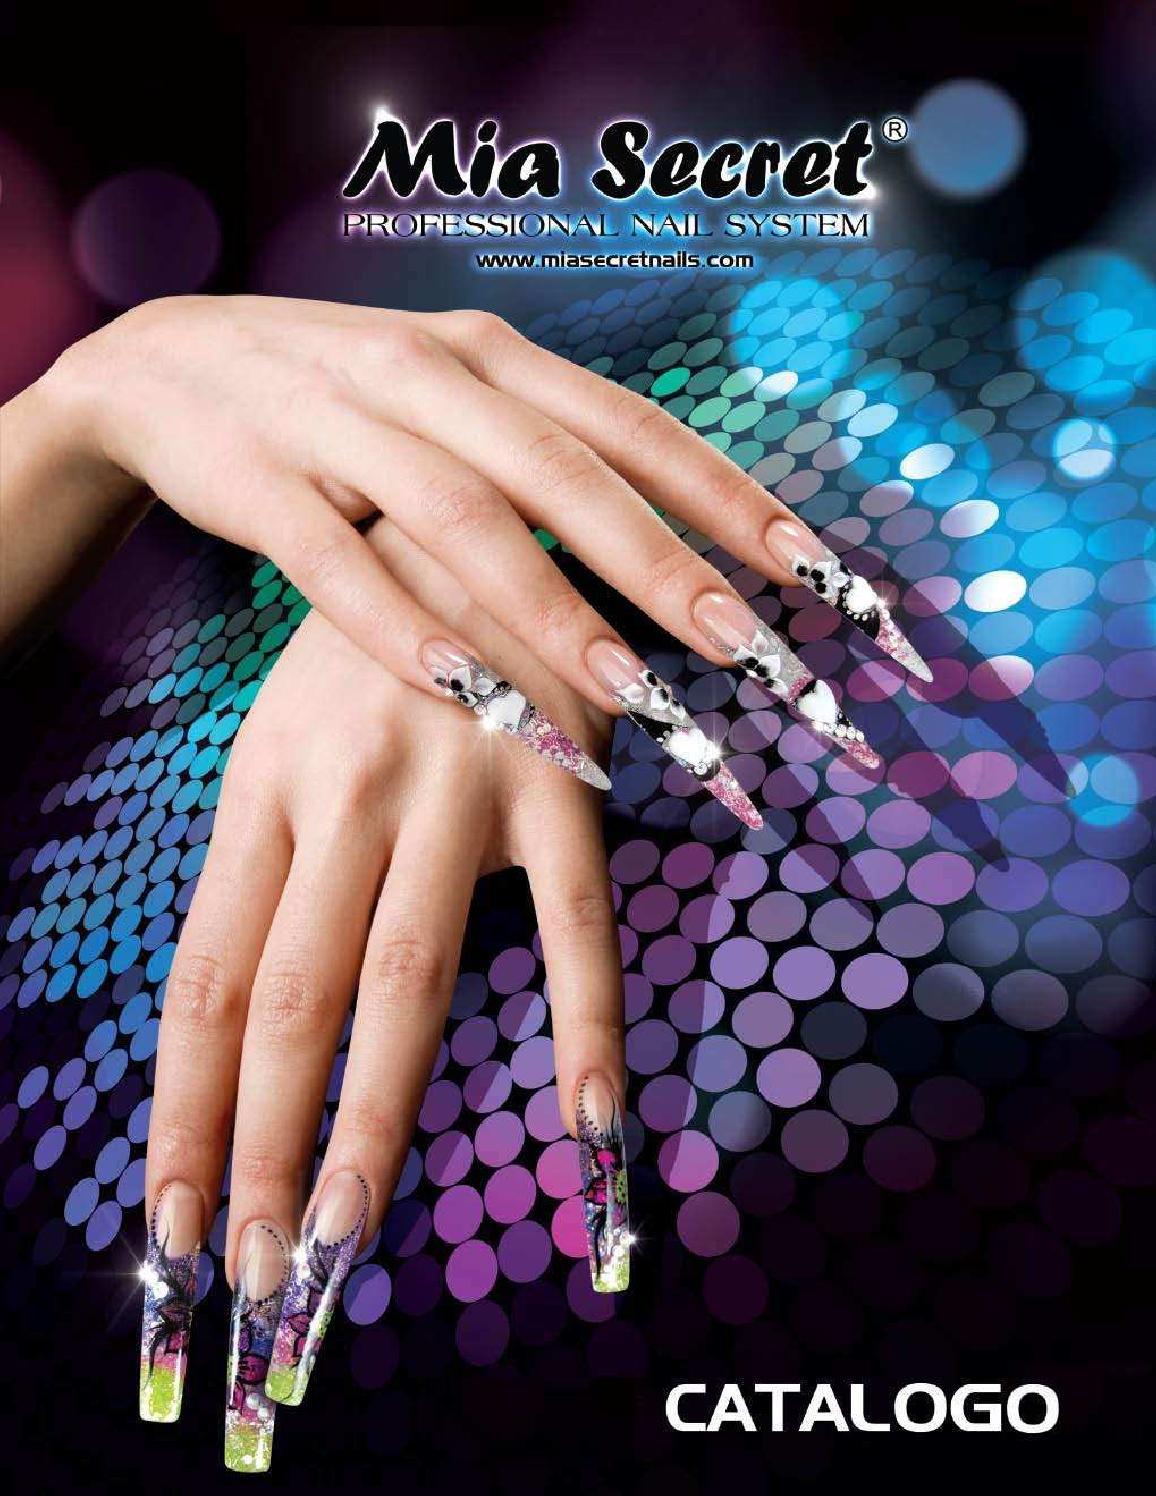 Mia Secret Nails - Catálogo by LINDA RUZ - issuu